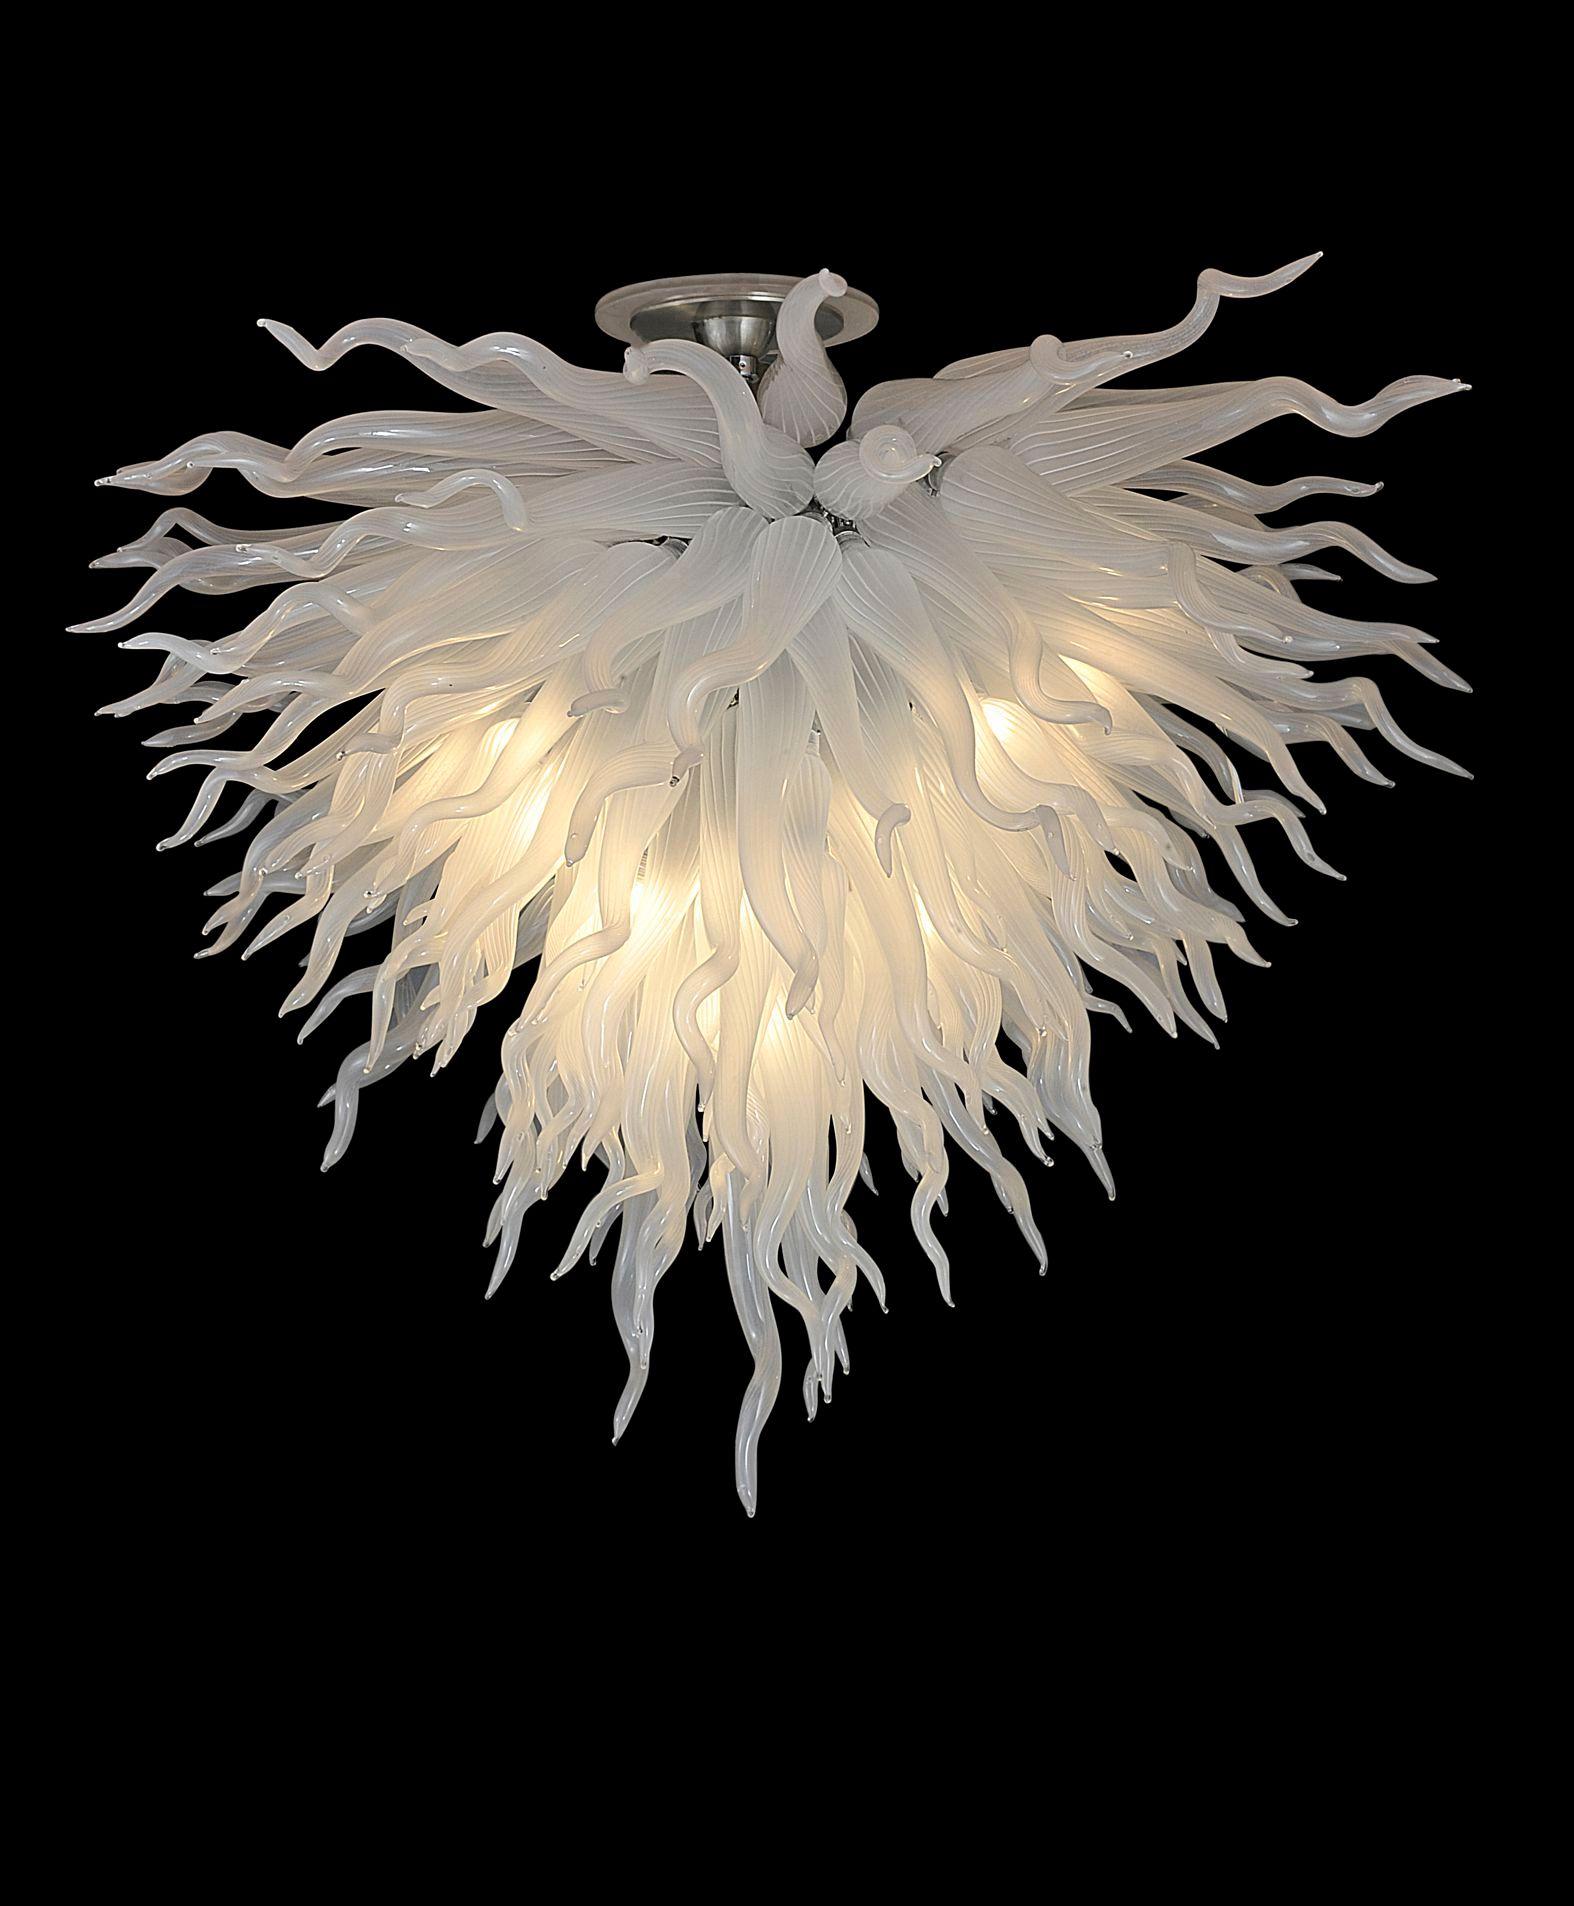 Big Sale Chihuly Estilo Chandelier Art design fosco branco mão soprado teto de vidro Murano Acende Designer